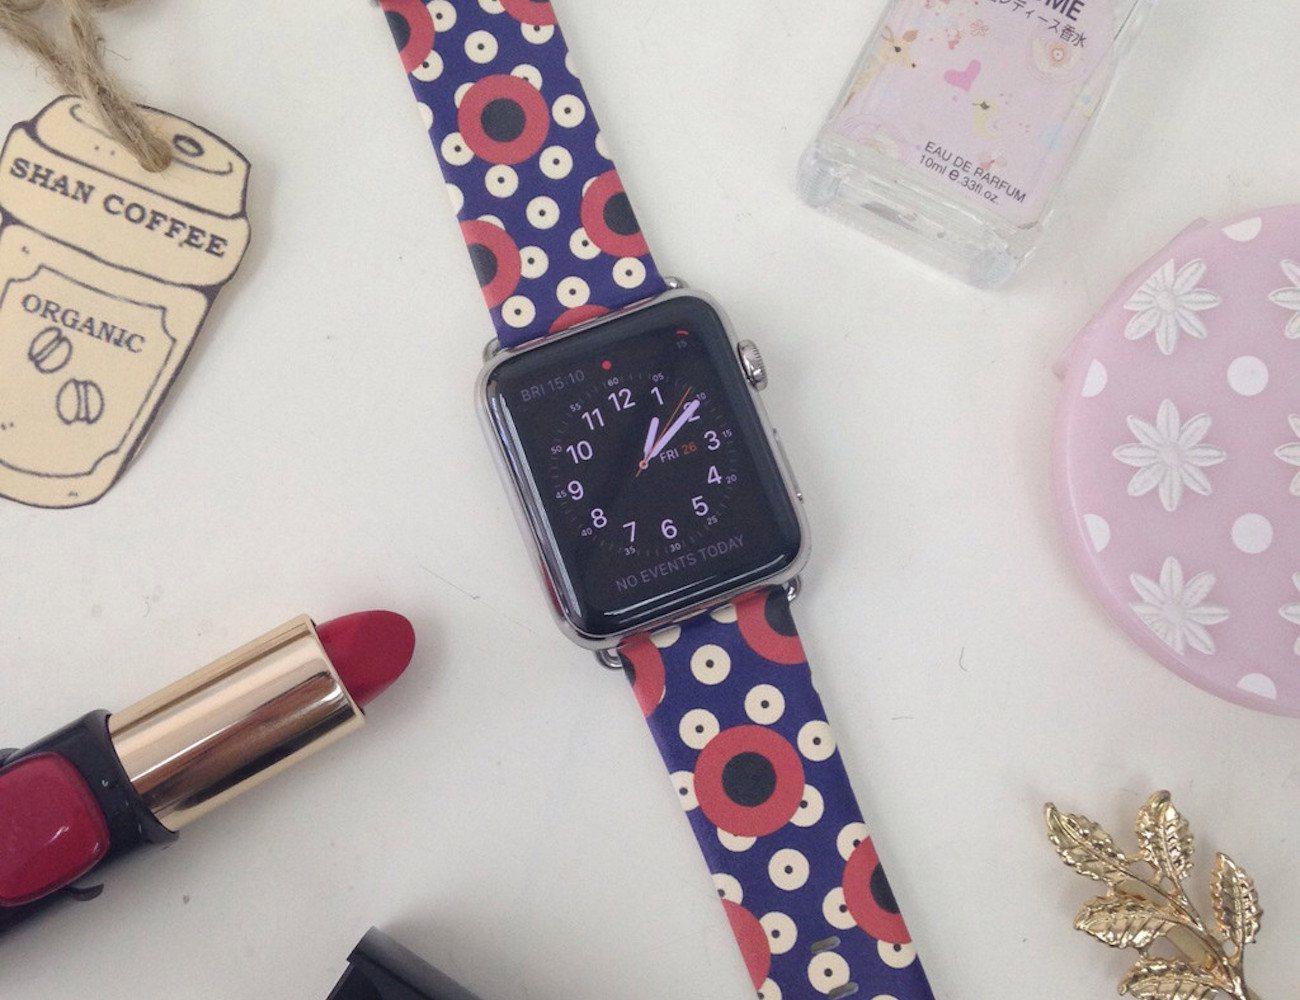 Apple Watch Straps by Ultra Case » Gadget Flow